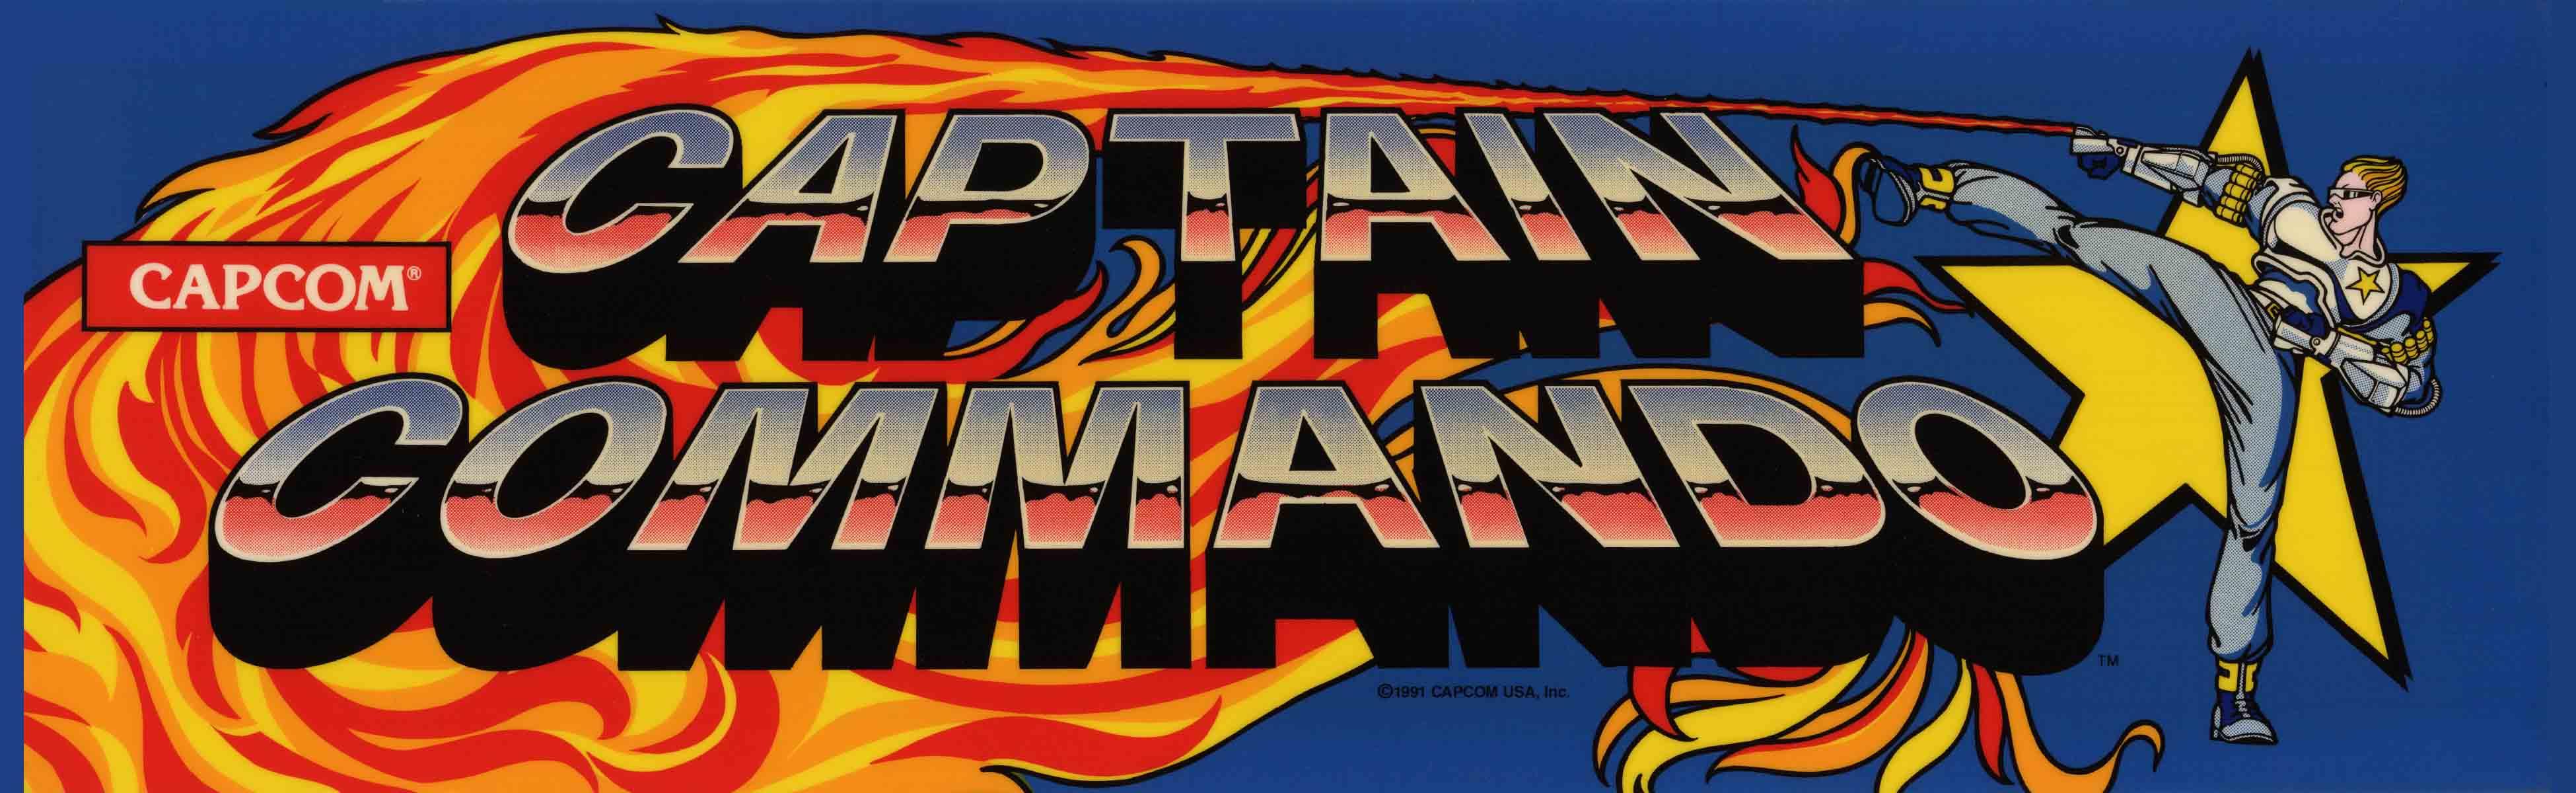 Nos Arcade Artworks préférés !! Captaincommando-marquee_kjez